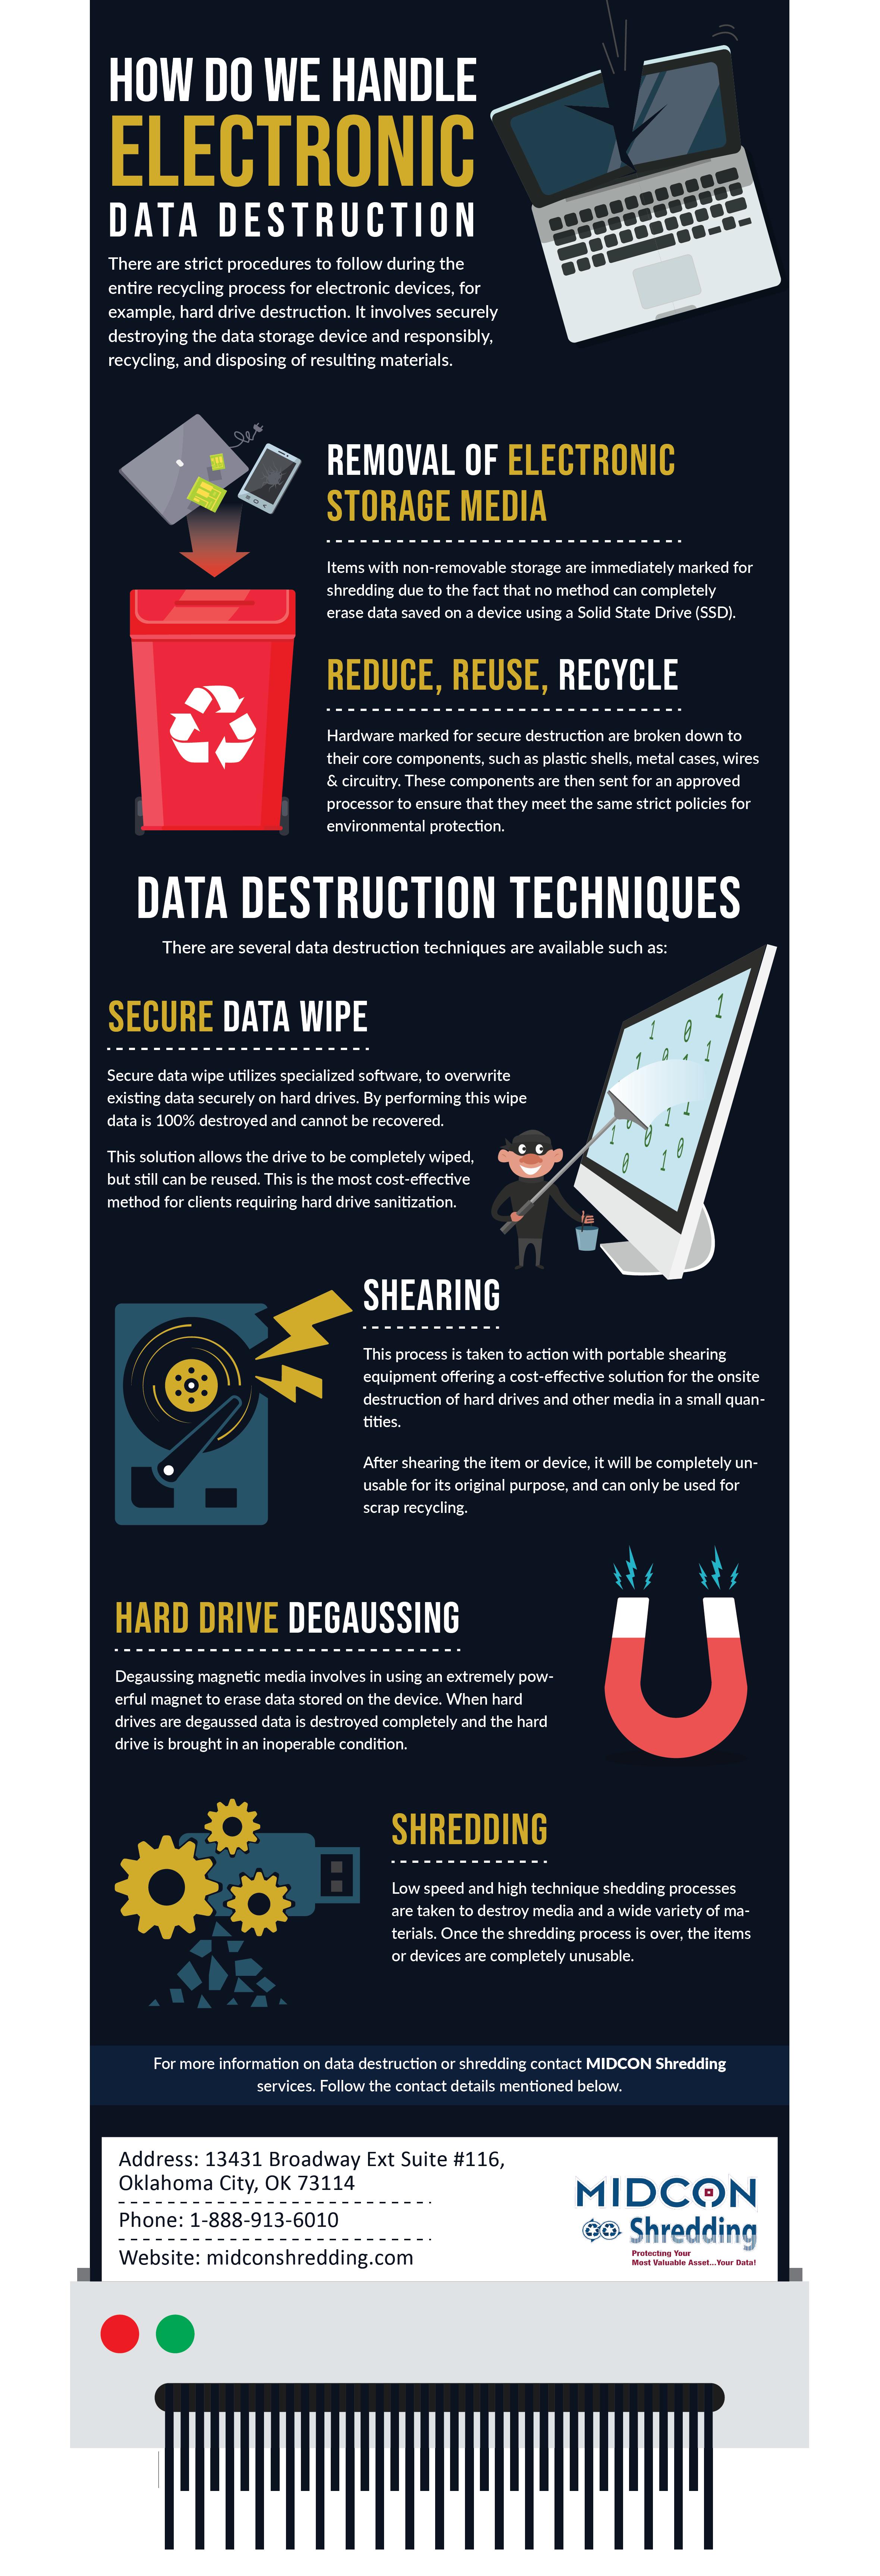 Midcon Shreddiing - Data Destruction okc.png